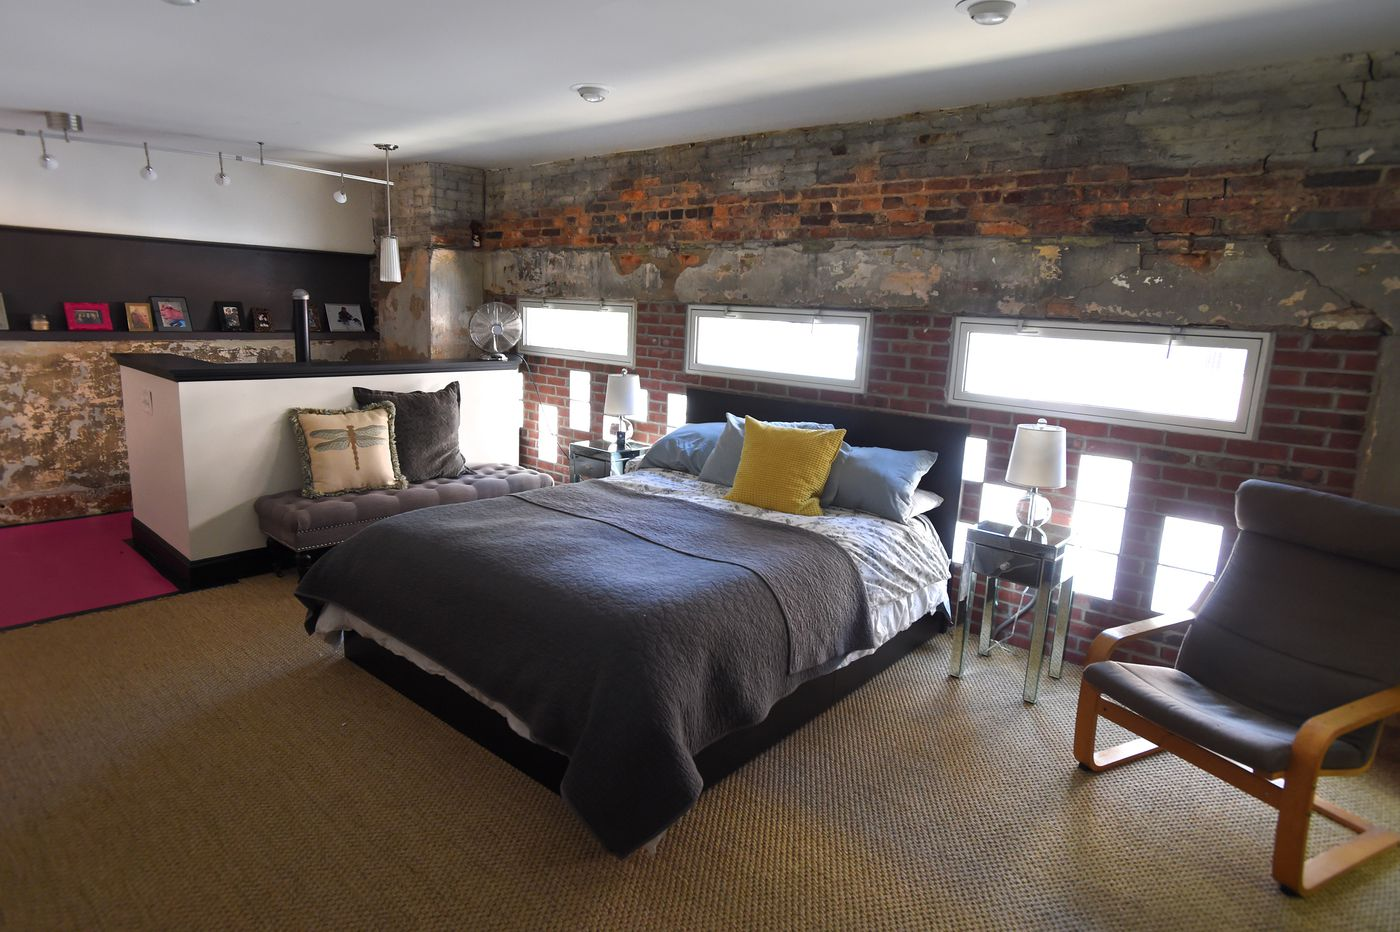 Garage Renovation Ideas For A Guest